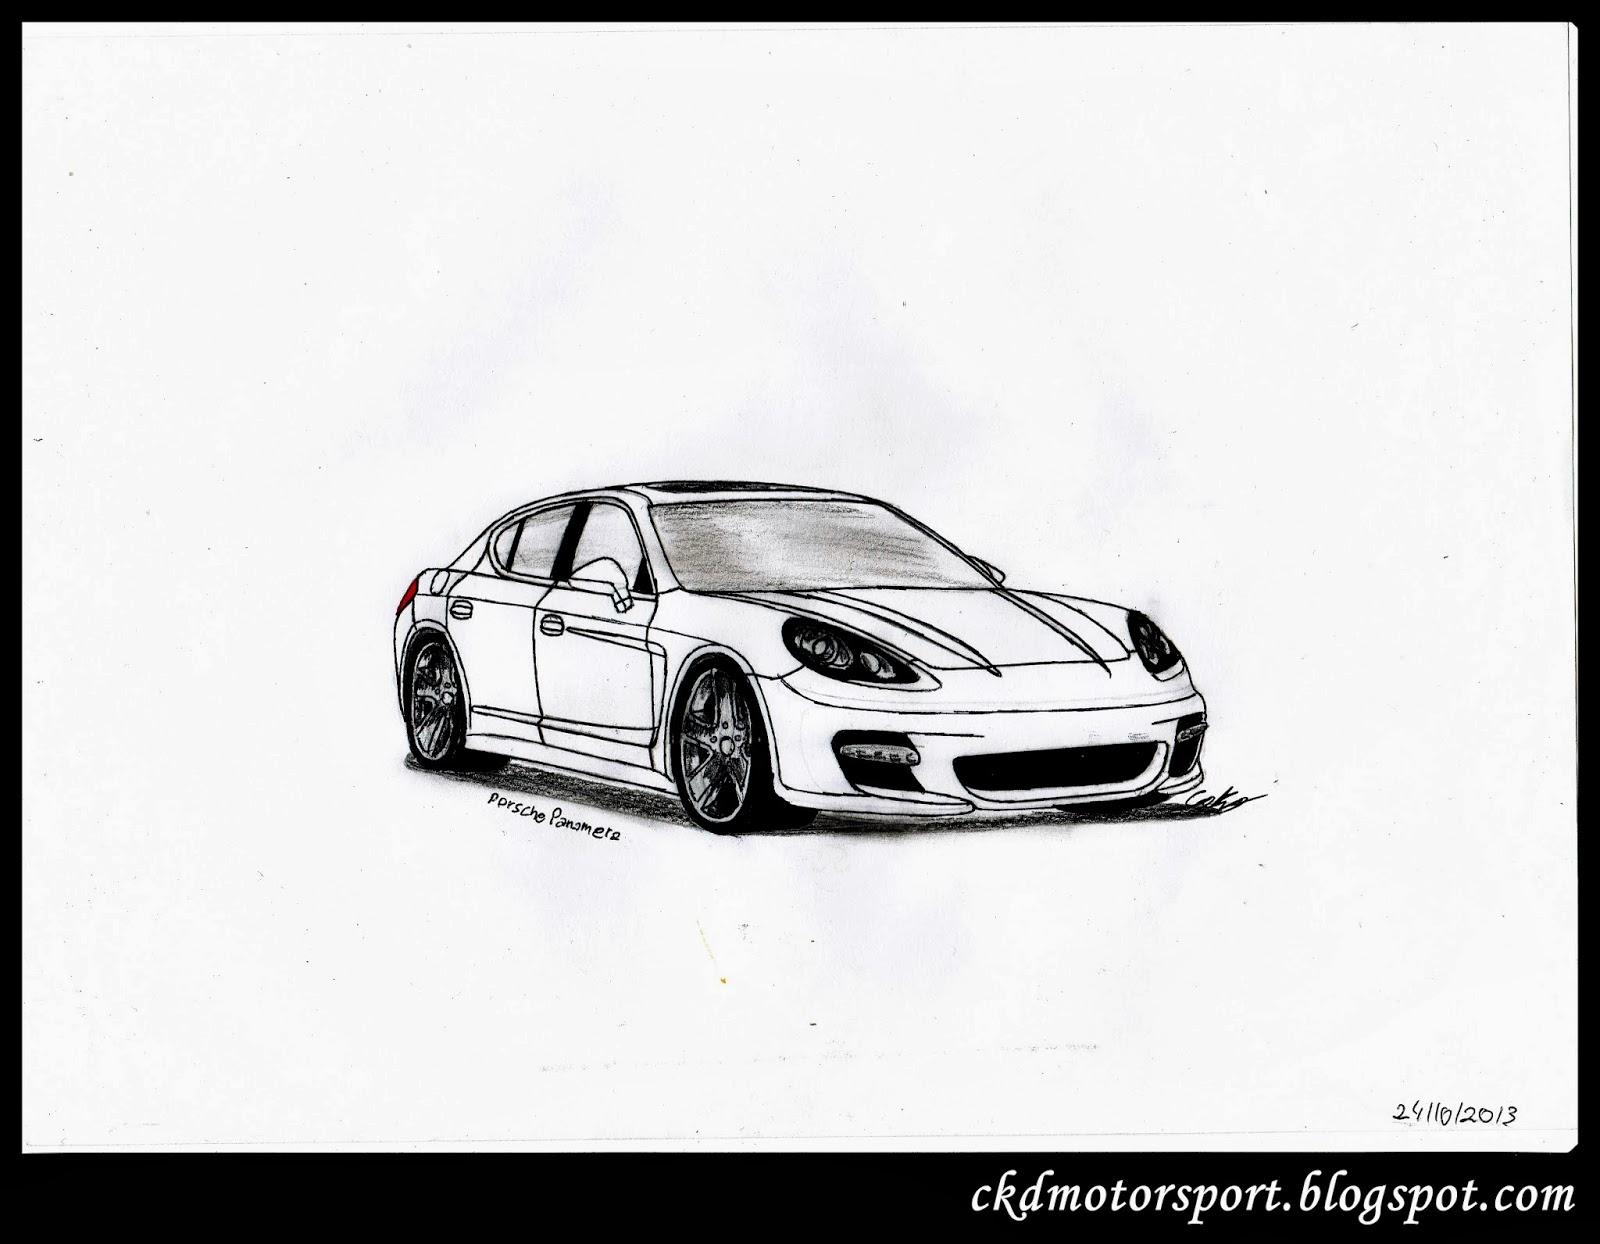 Ckd Motorsport Porsche Panamera